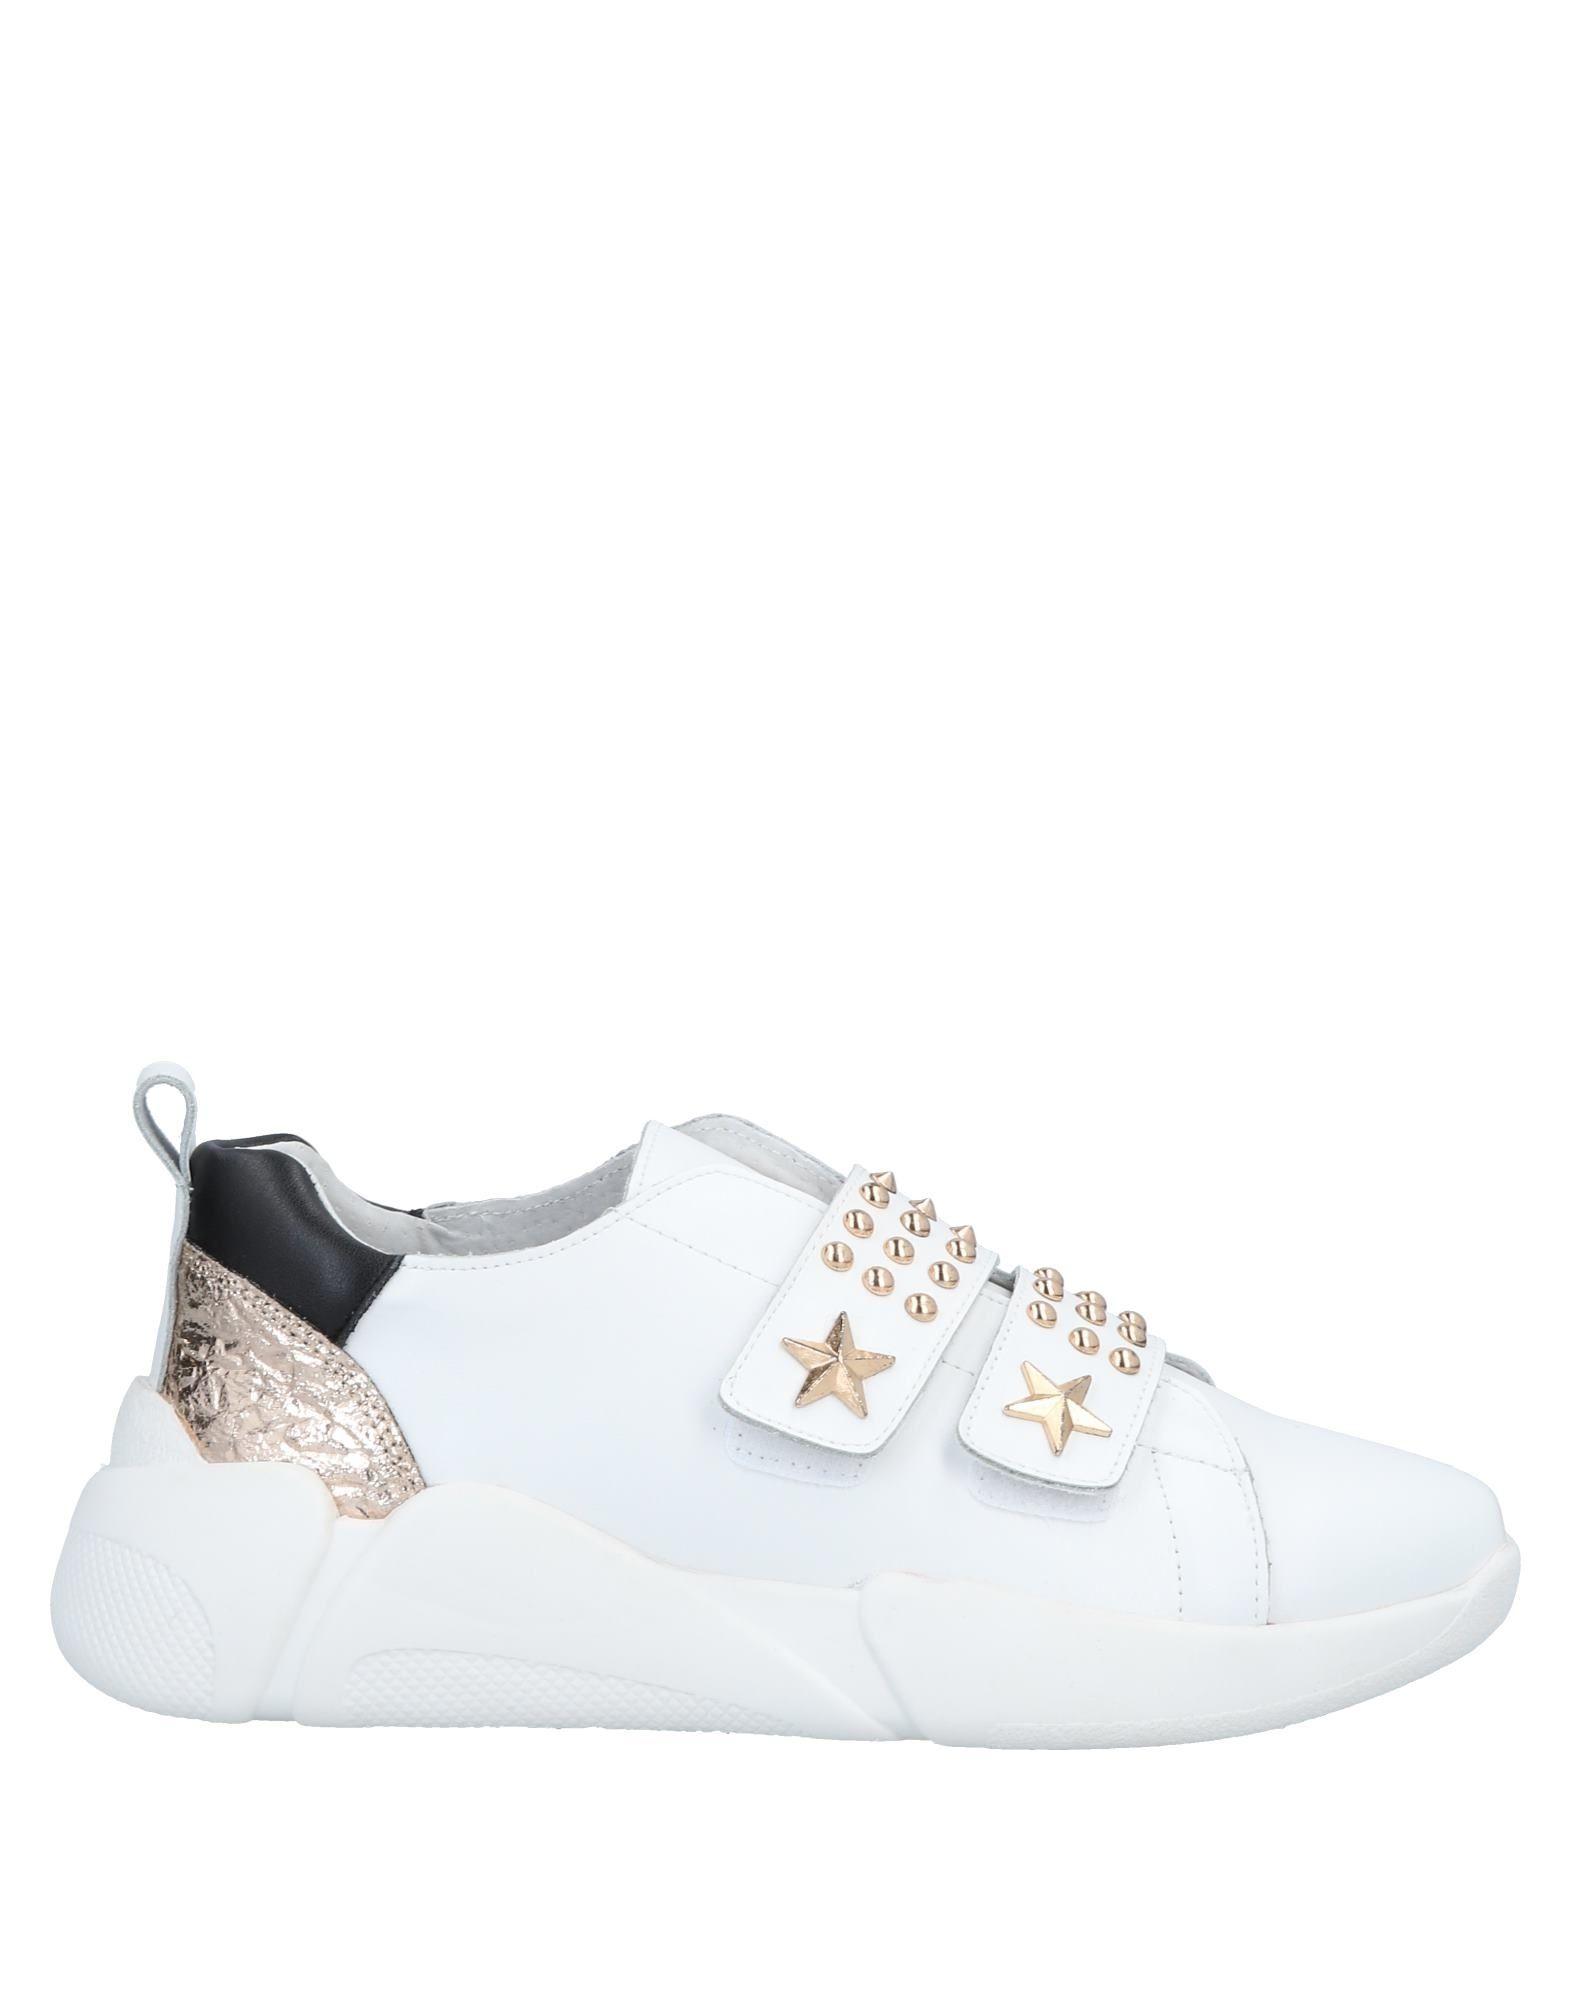 Stilvolle California billige Schuhe Colors Of California Stilvolle Sneakers Damen  11566897SL 18fd27